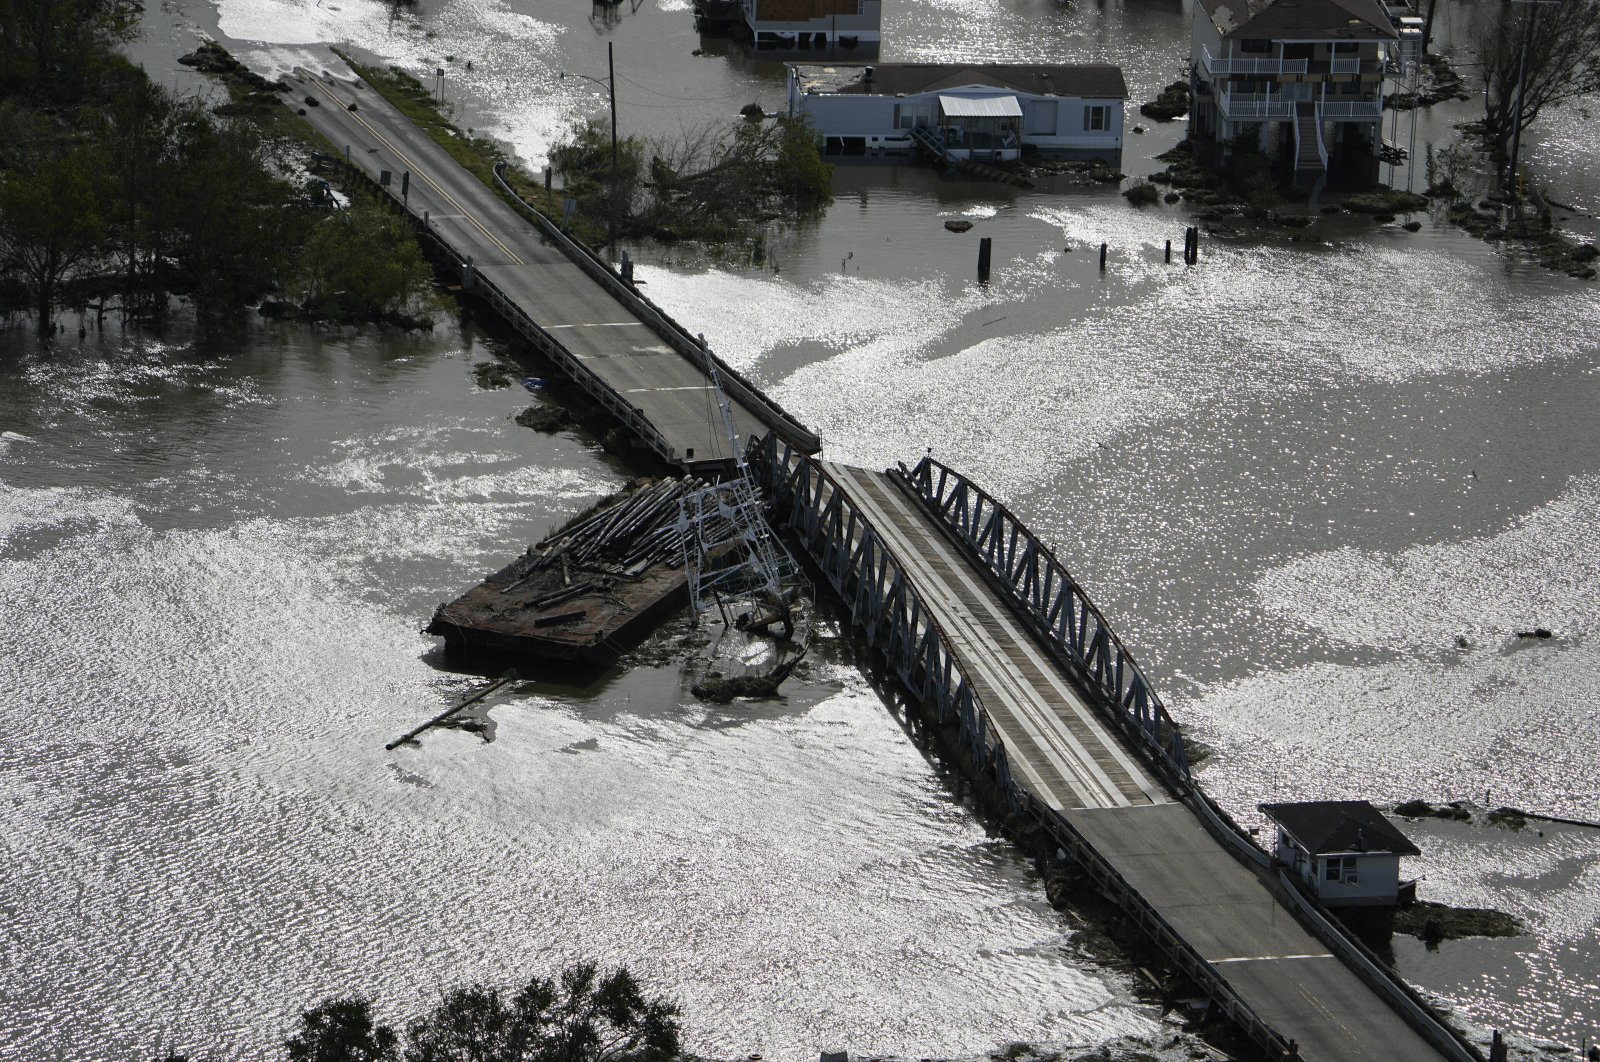 A barge damages a bridge that divides Lafitte, La., and Jean Lafitte, in the aftermath of Hurricane Ida, Aug. 30, 2021, in Lafitte, La. (AP Photo)